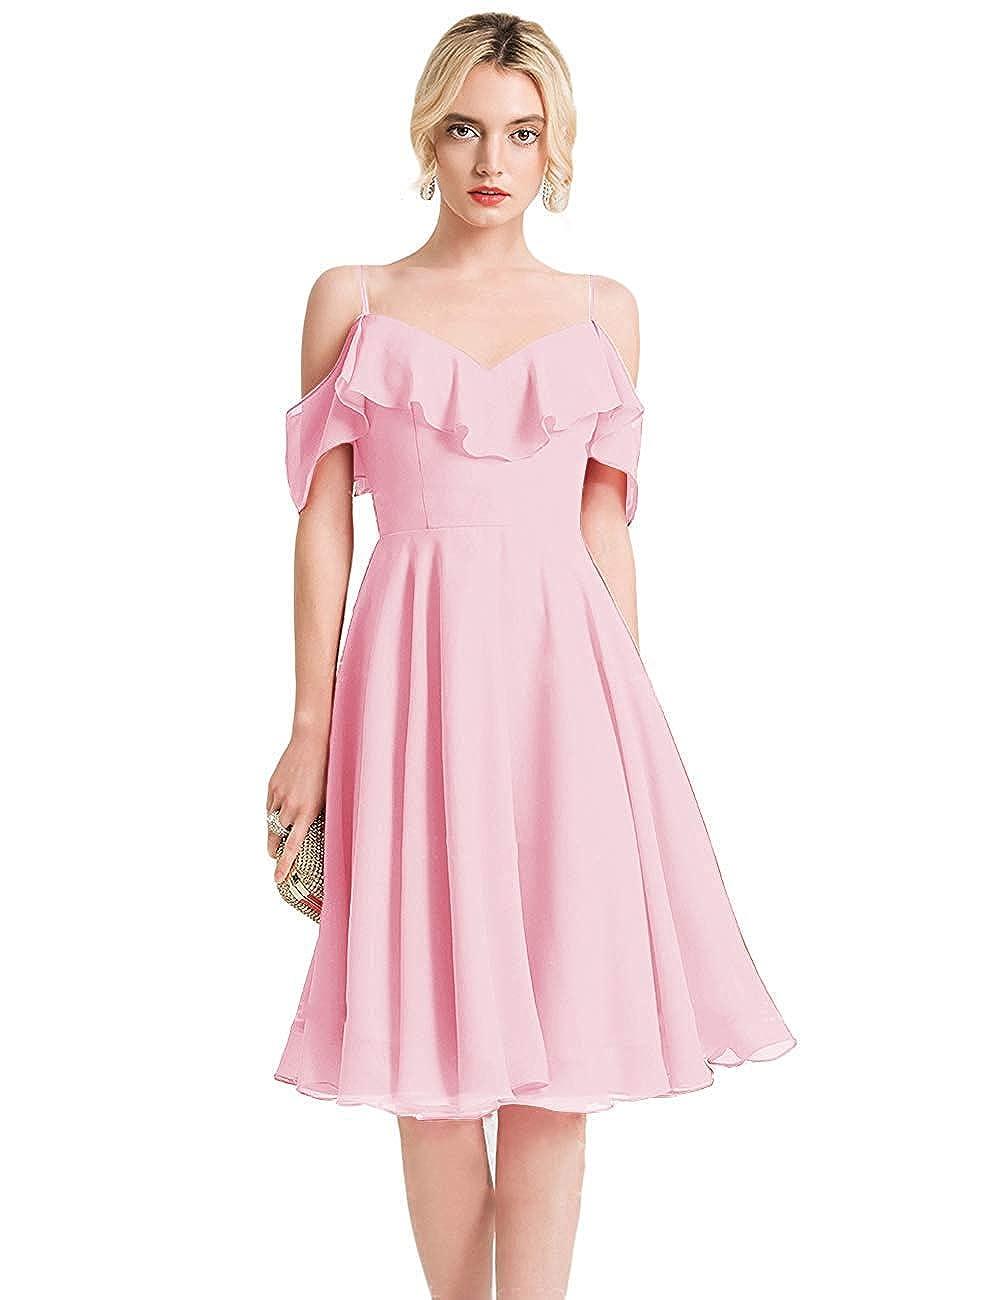 blueshB FeiYueXinXing VNeck Ruffled Spaghetti Strap Prom Dresses Long Formal Evening Gown